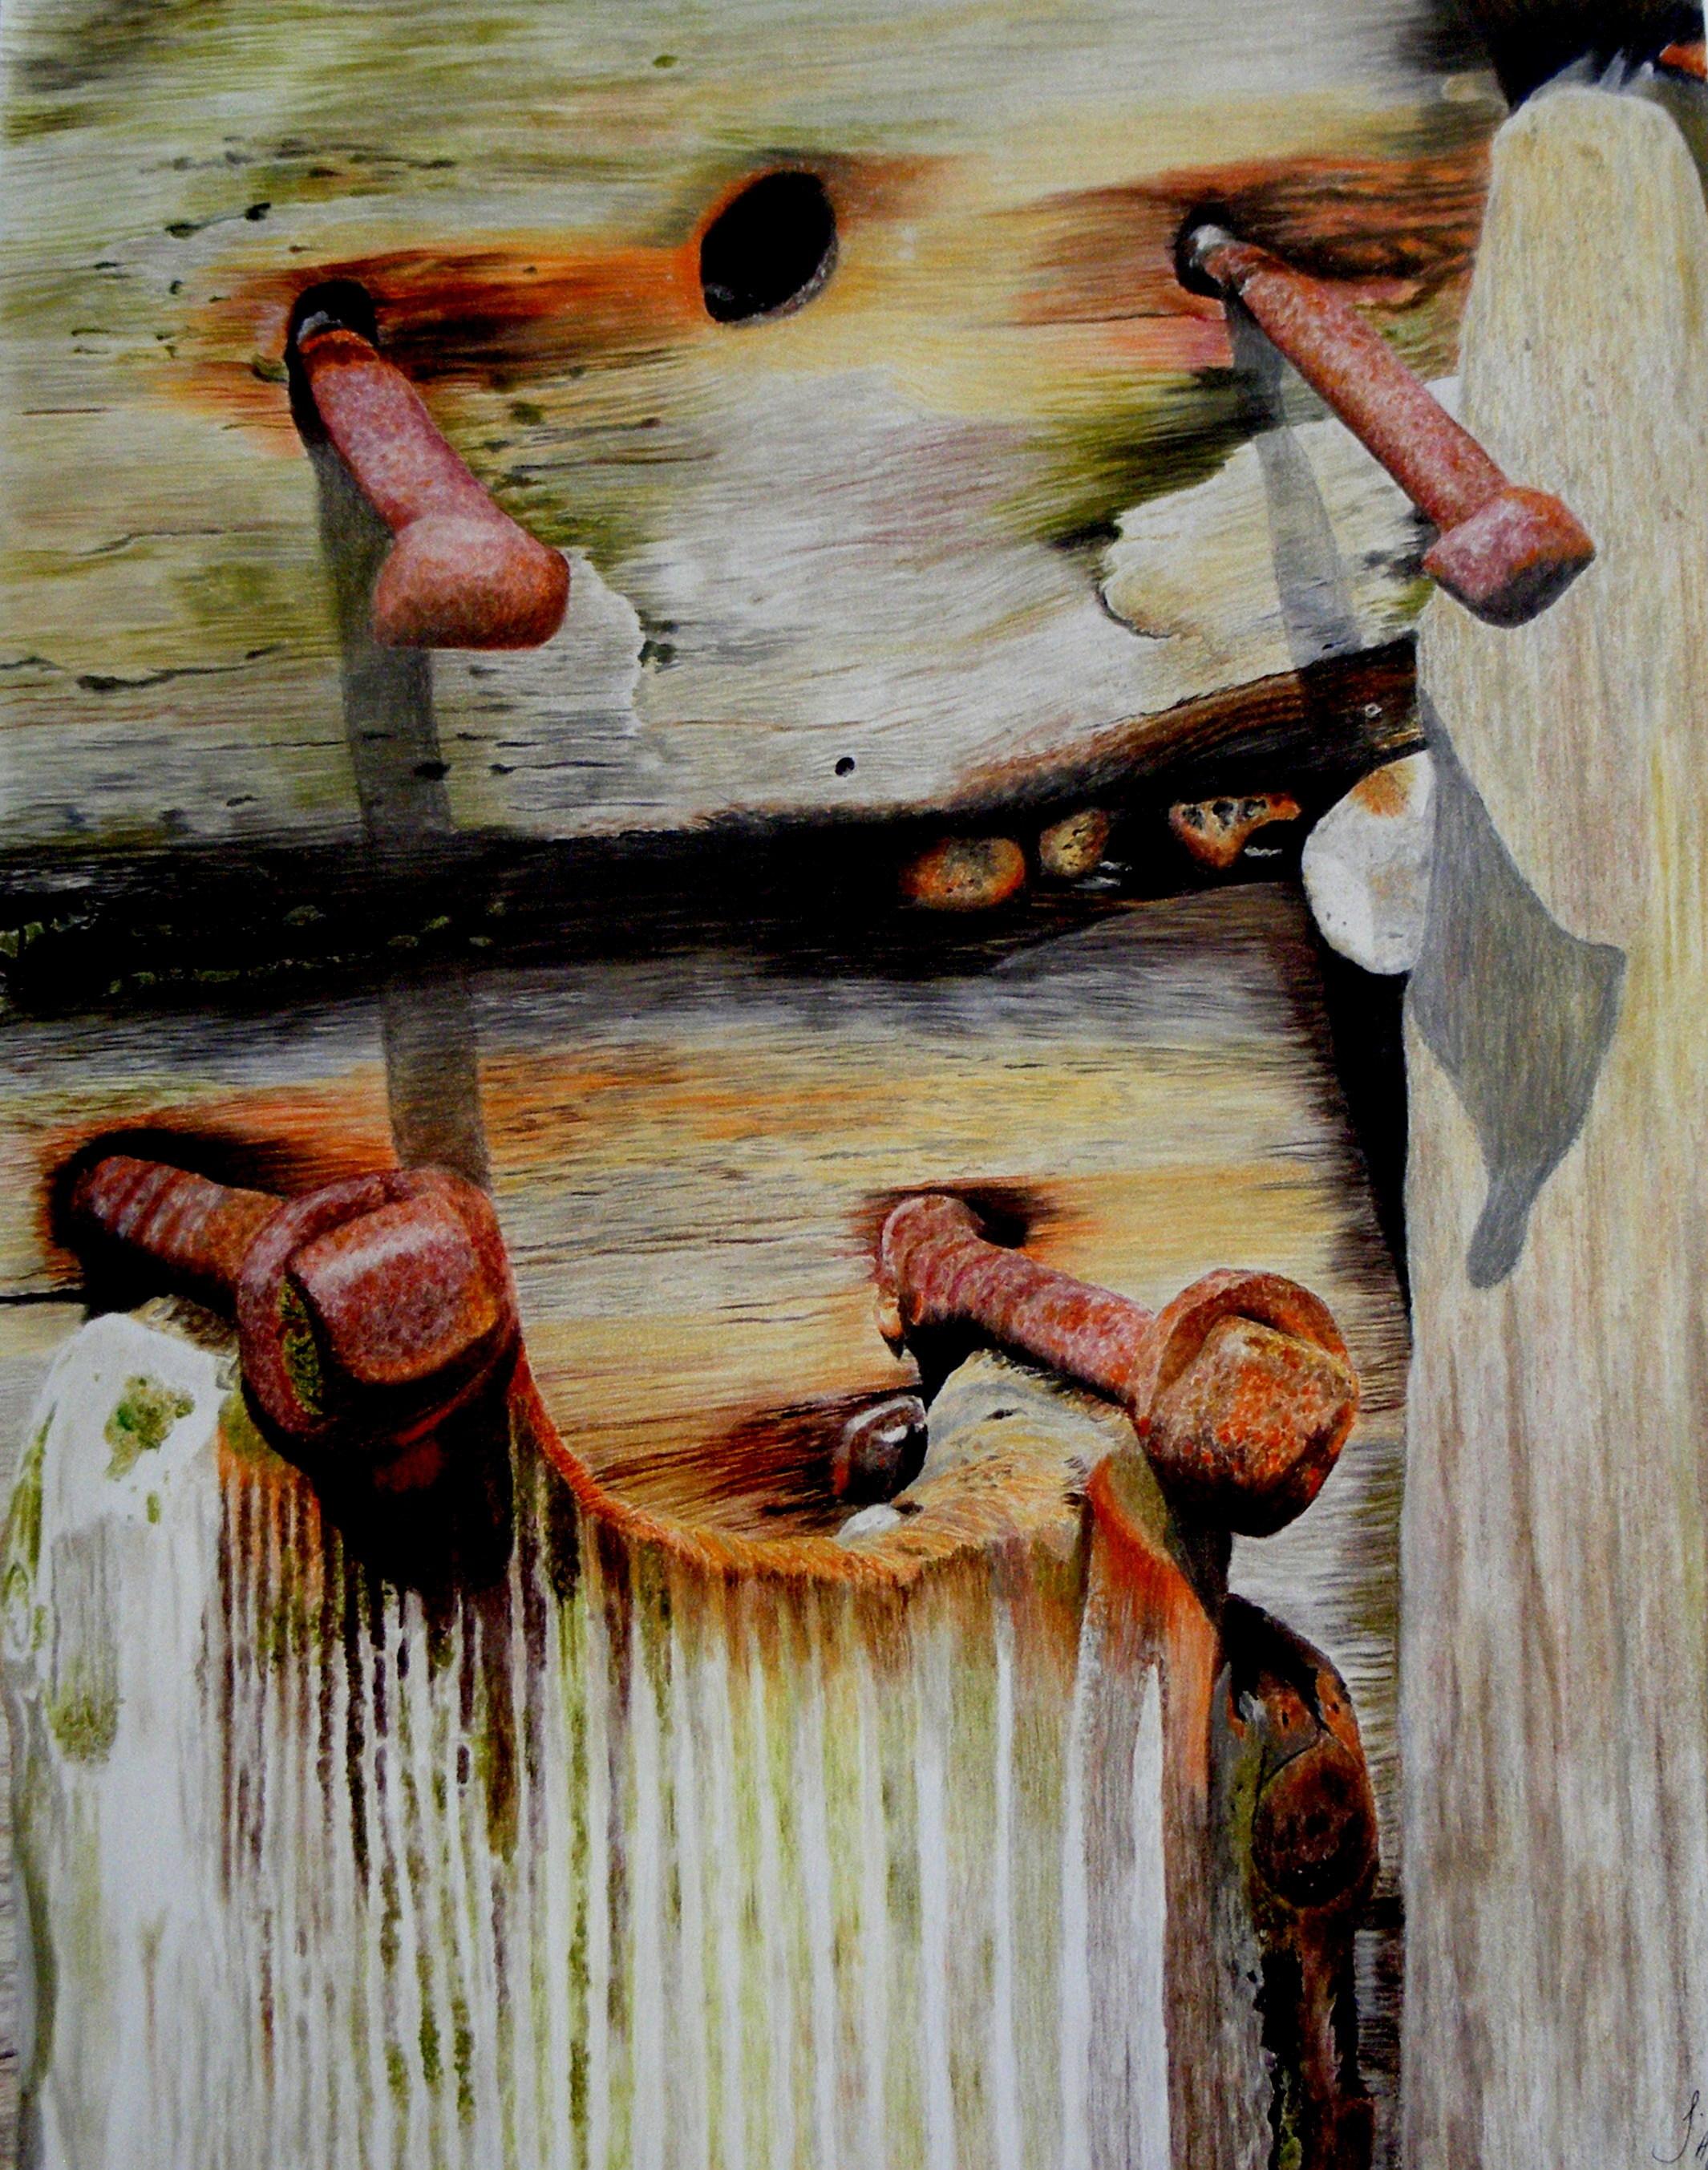 Jayne Morgan, Groyne on Bognor Beach, Pastels and pastel pencils on paper, 56 x 41x 1 cm